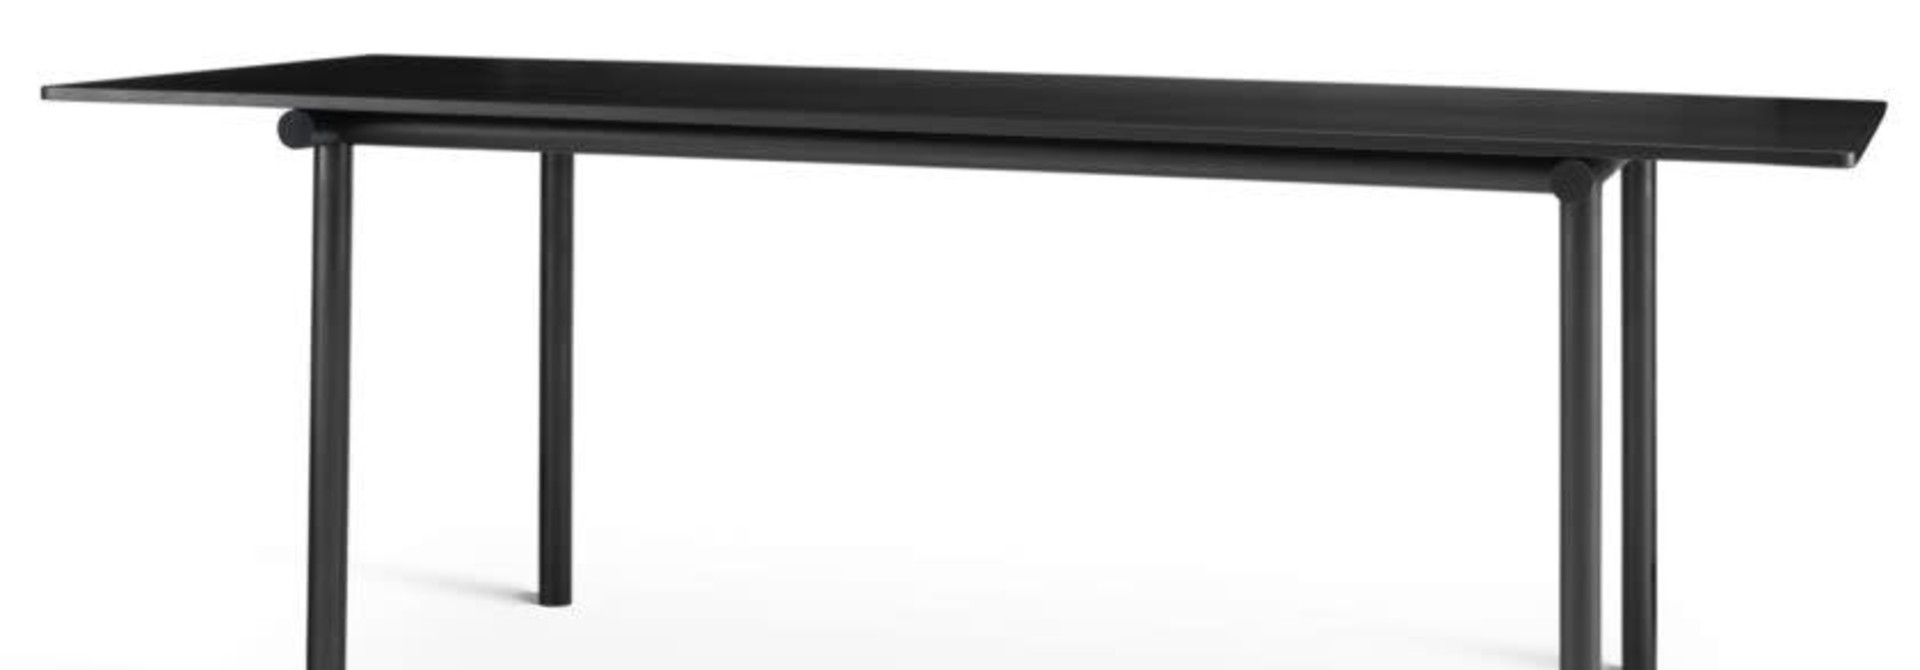 Tubby Tube Table - Black Frame 270 x 90 cm.